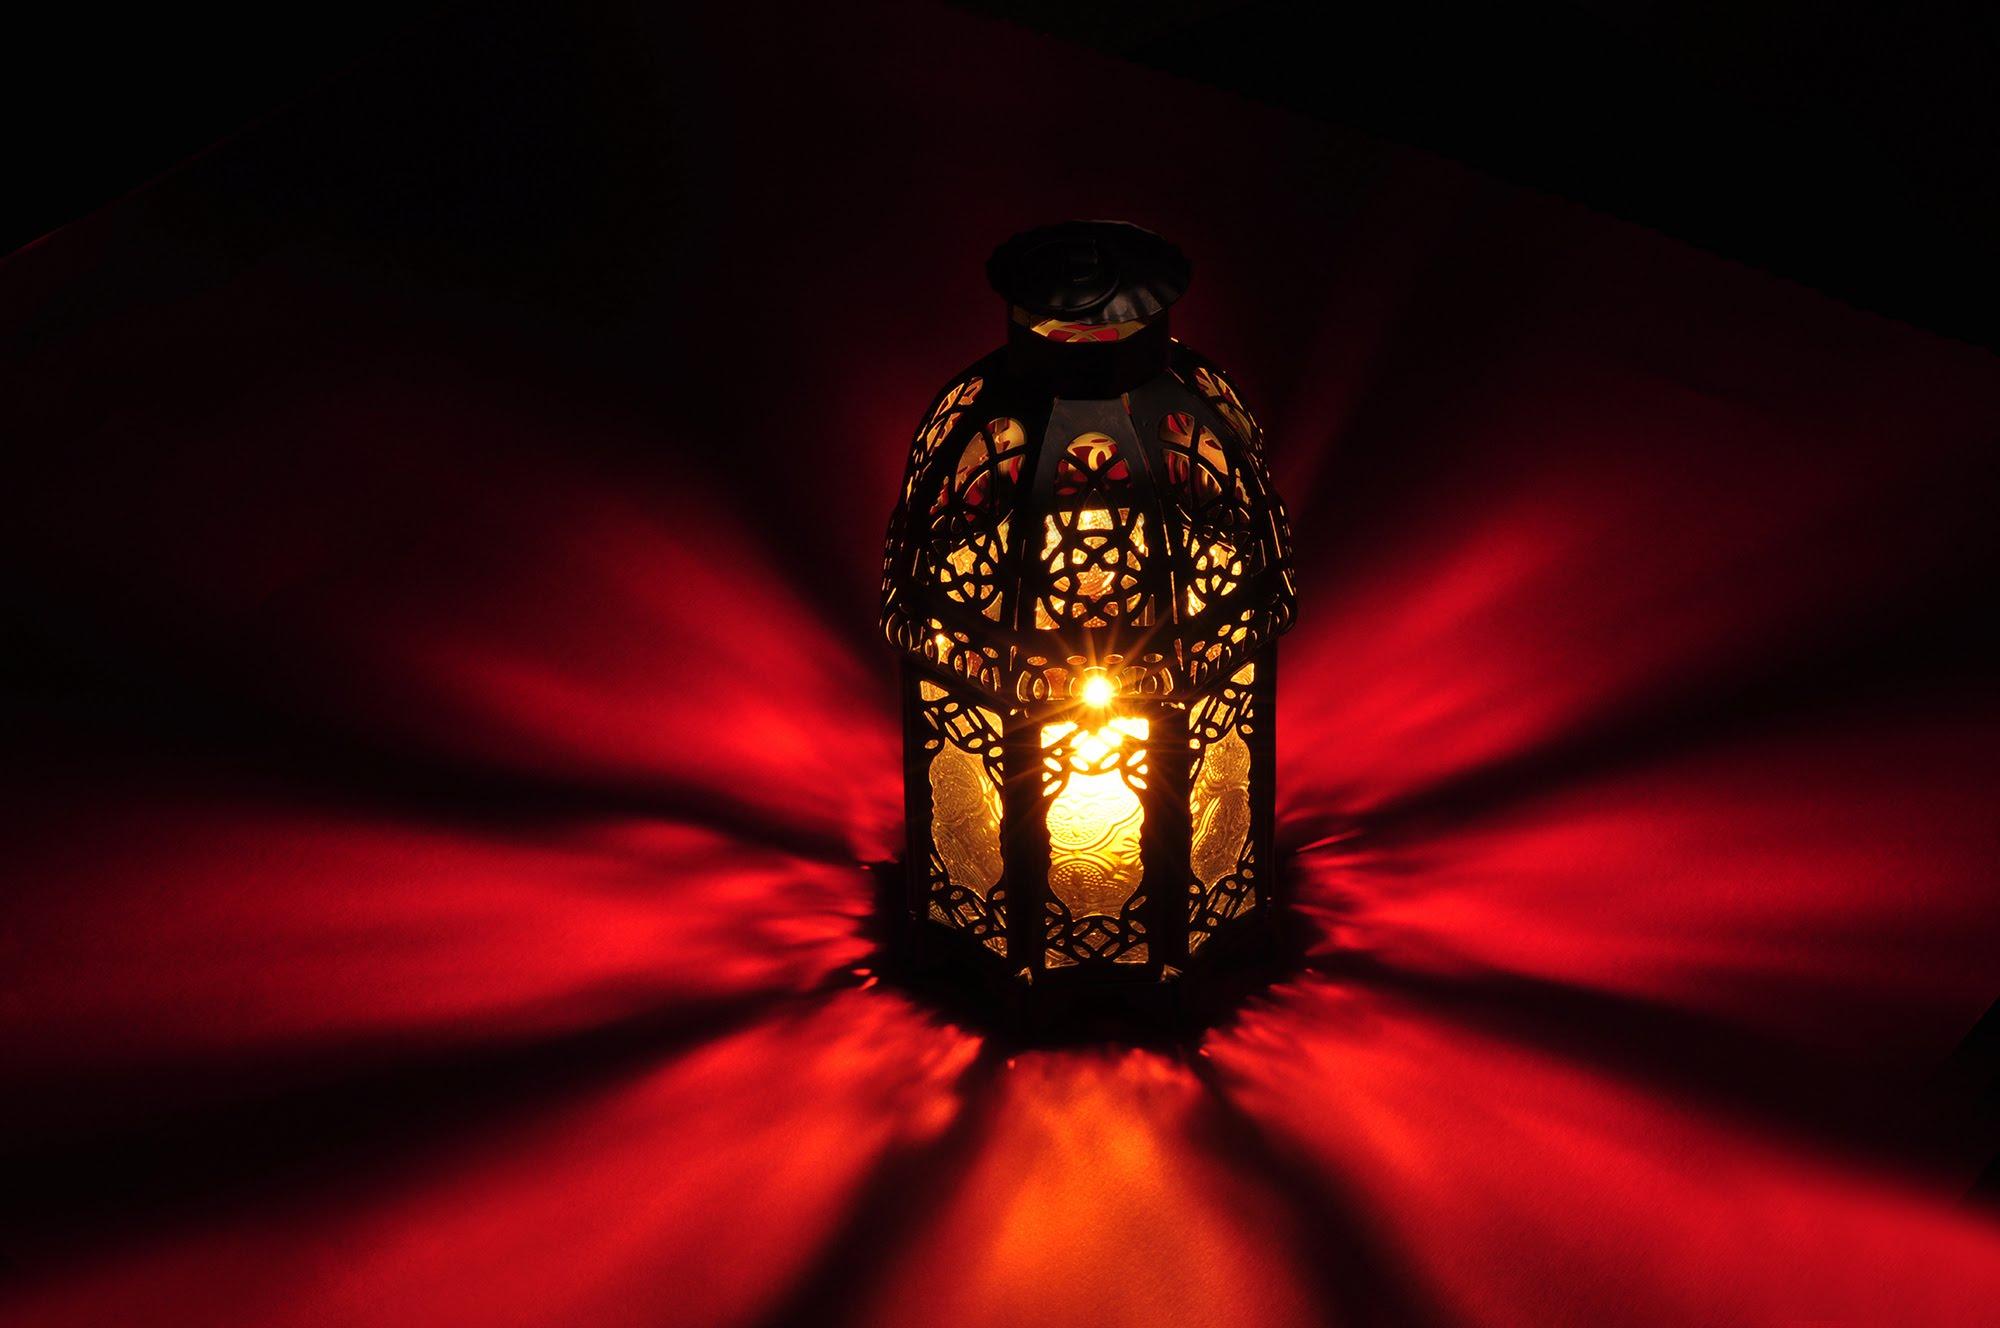 صورة فانوس رمضان , اروع فوانيس لشهر رمضان 5147 4